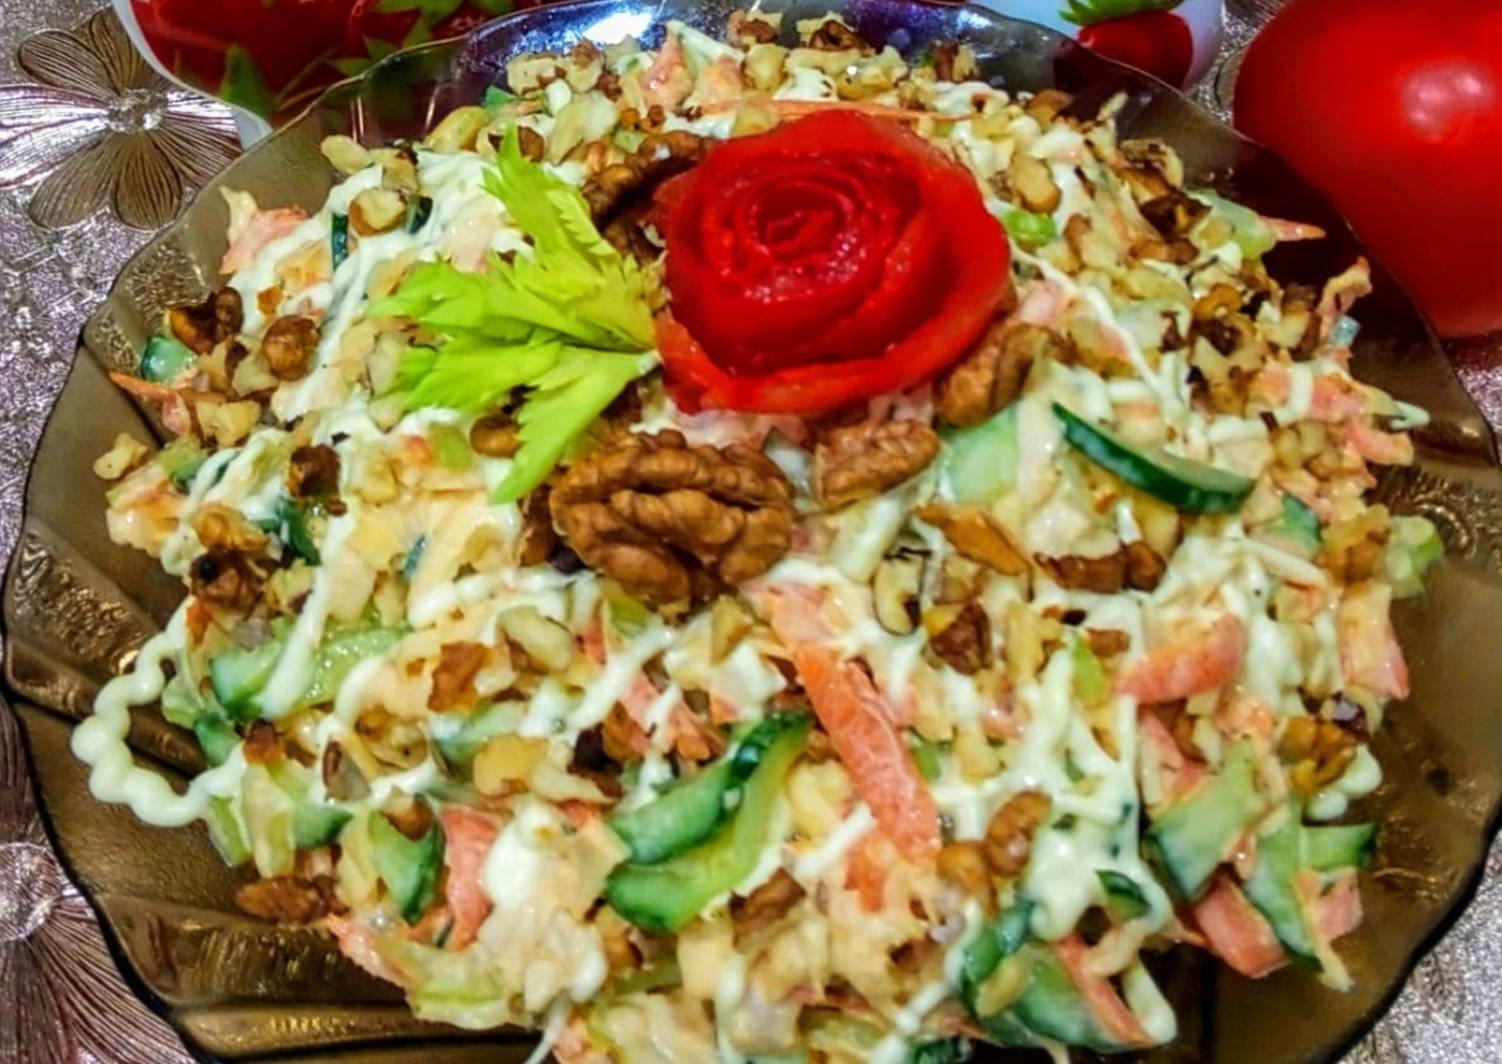 салат сантана рецепт с фото что